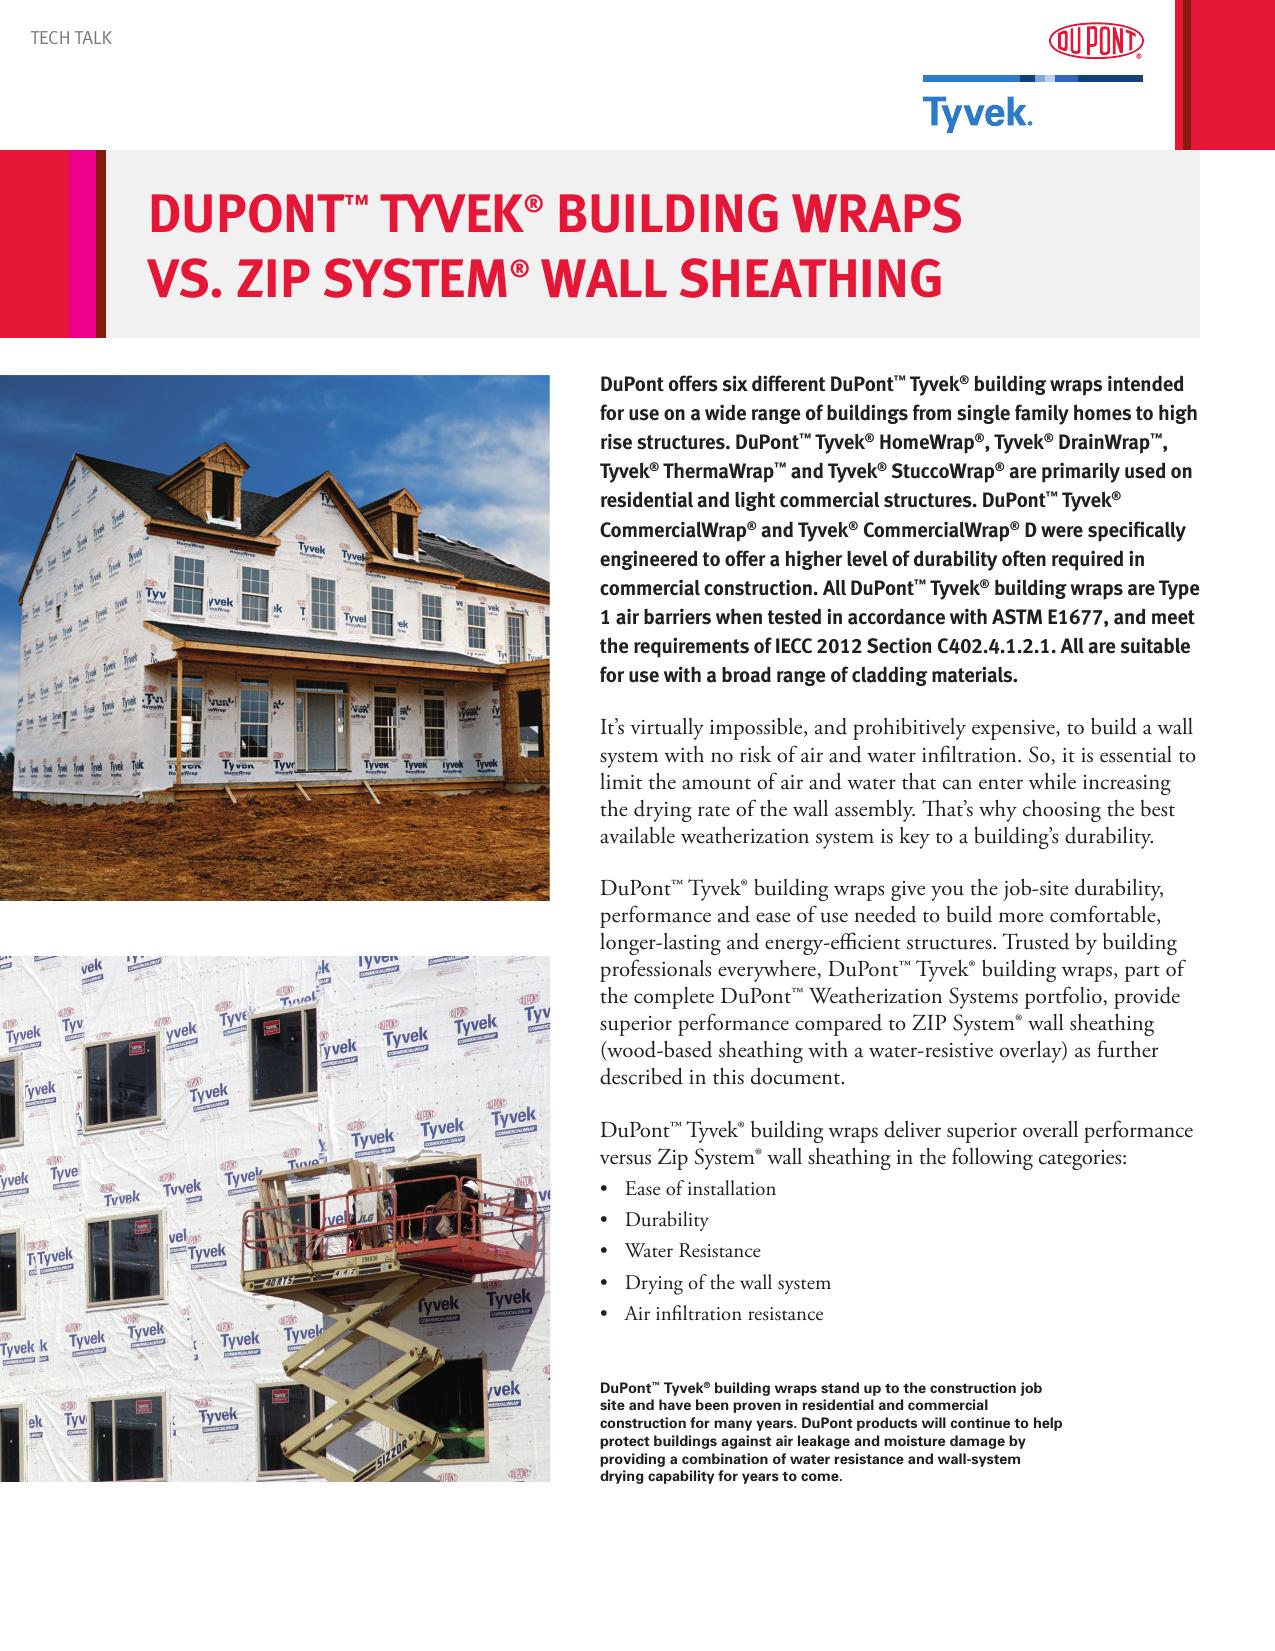 Dupont Tyvek Building Wraps Vs Zip System Wall Sheathing